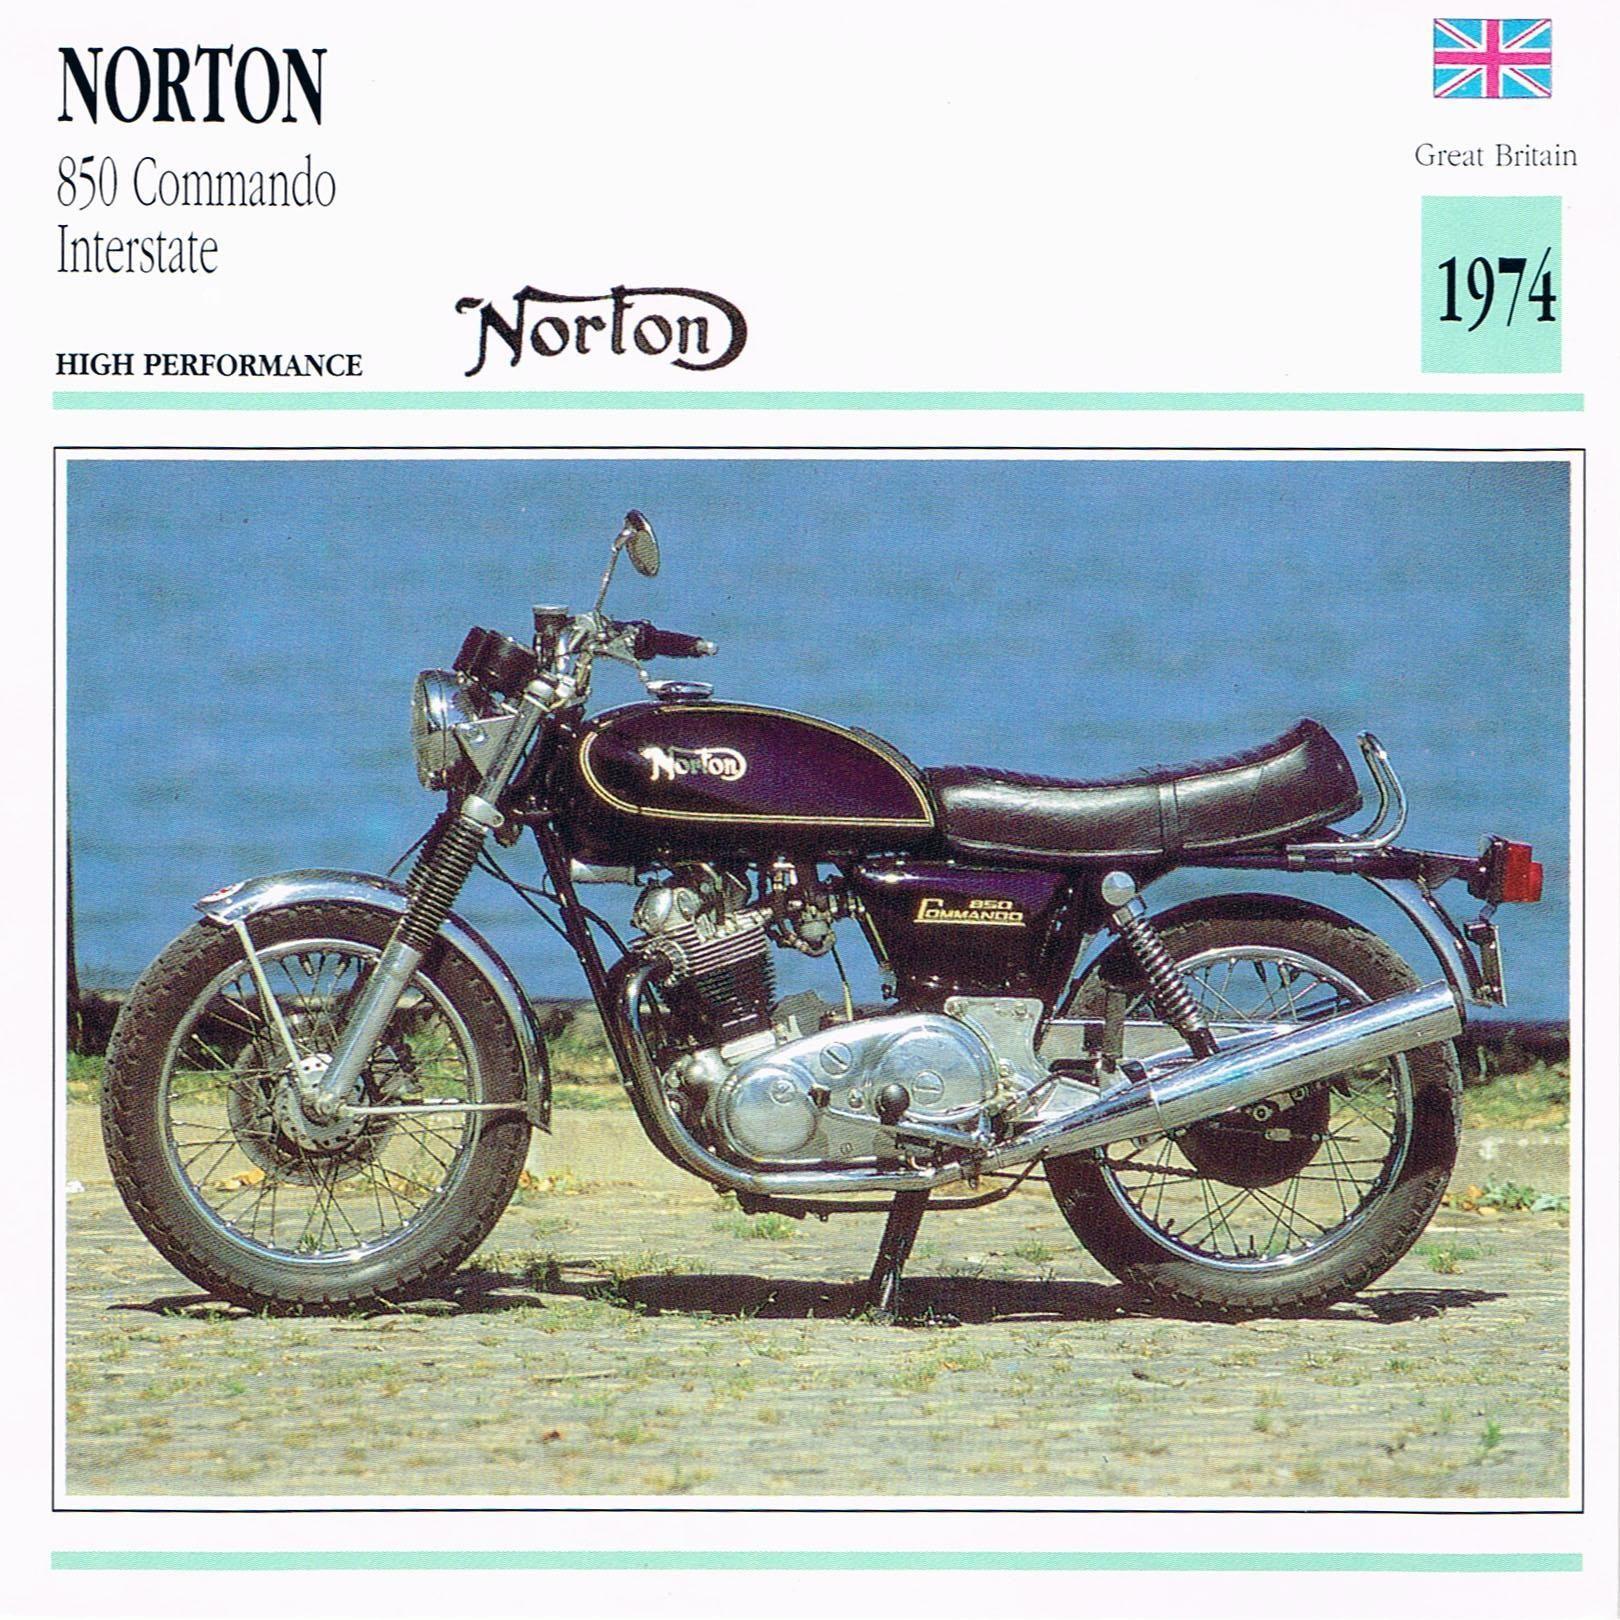 1974 Norton 850 Commando Interstate Bike Eatsleepride